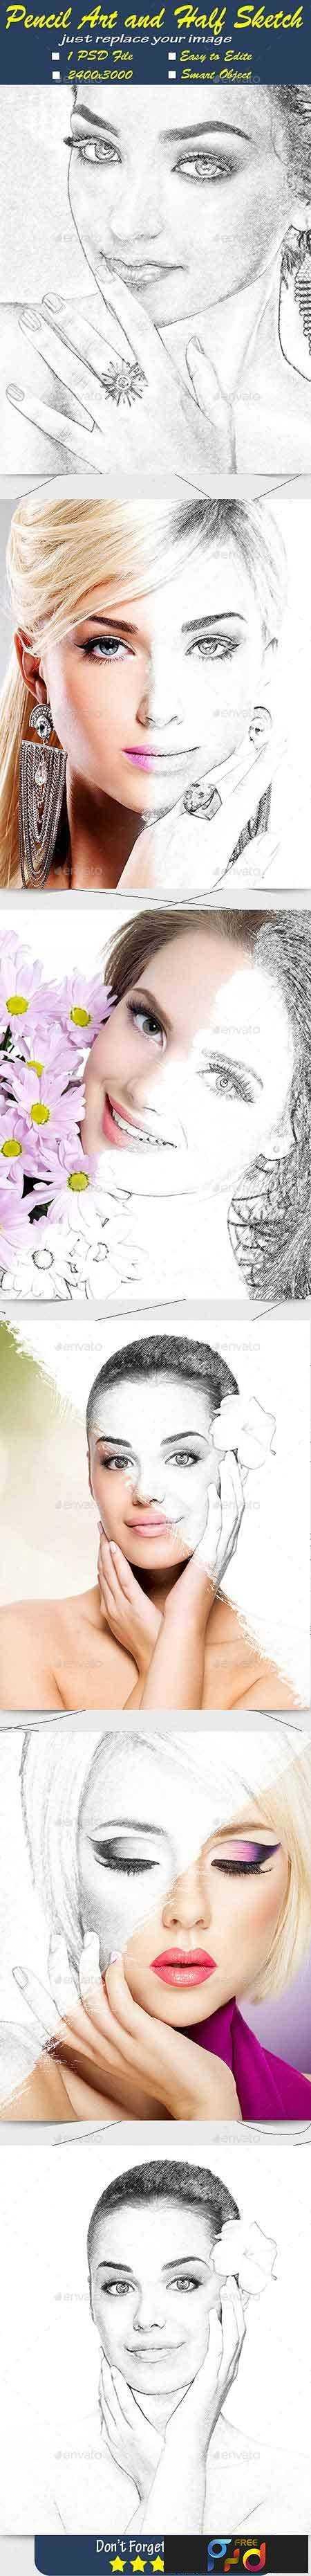 FreePsdVn.com_1702009_PHOTOSHOP_pencil_art_and_half_sketch_template_16479175